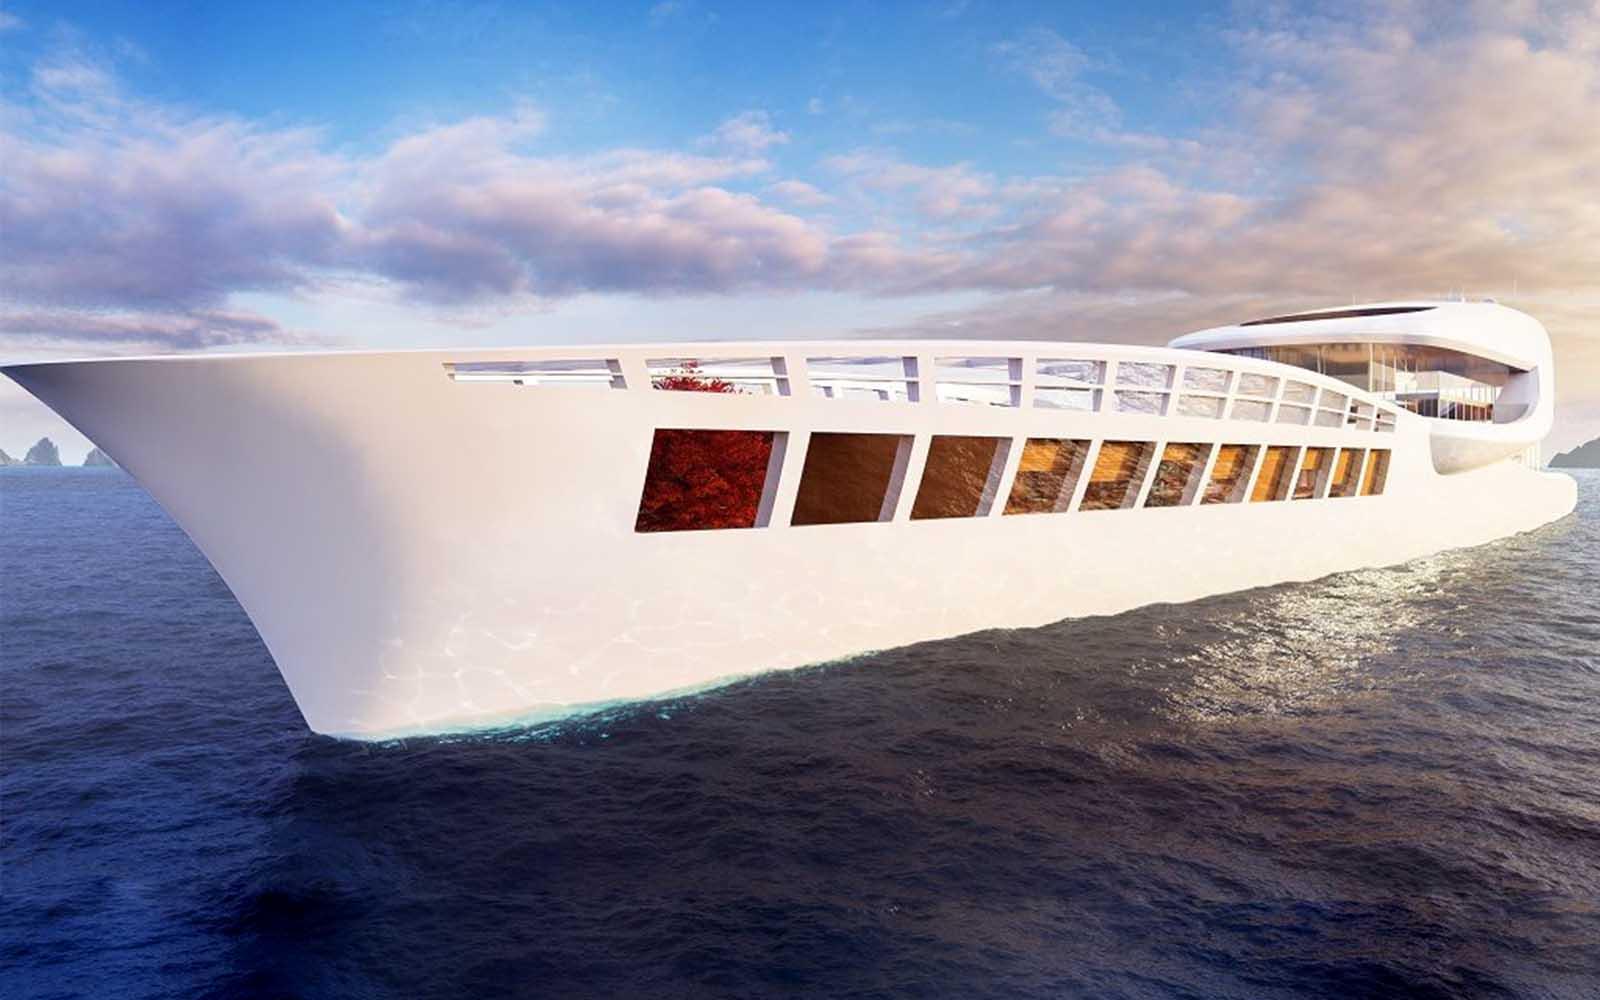 hop megayacht - boat shopping